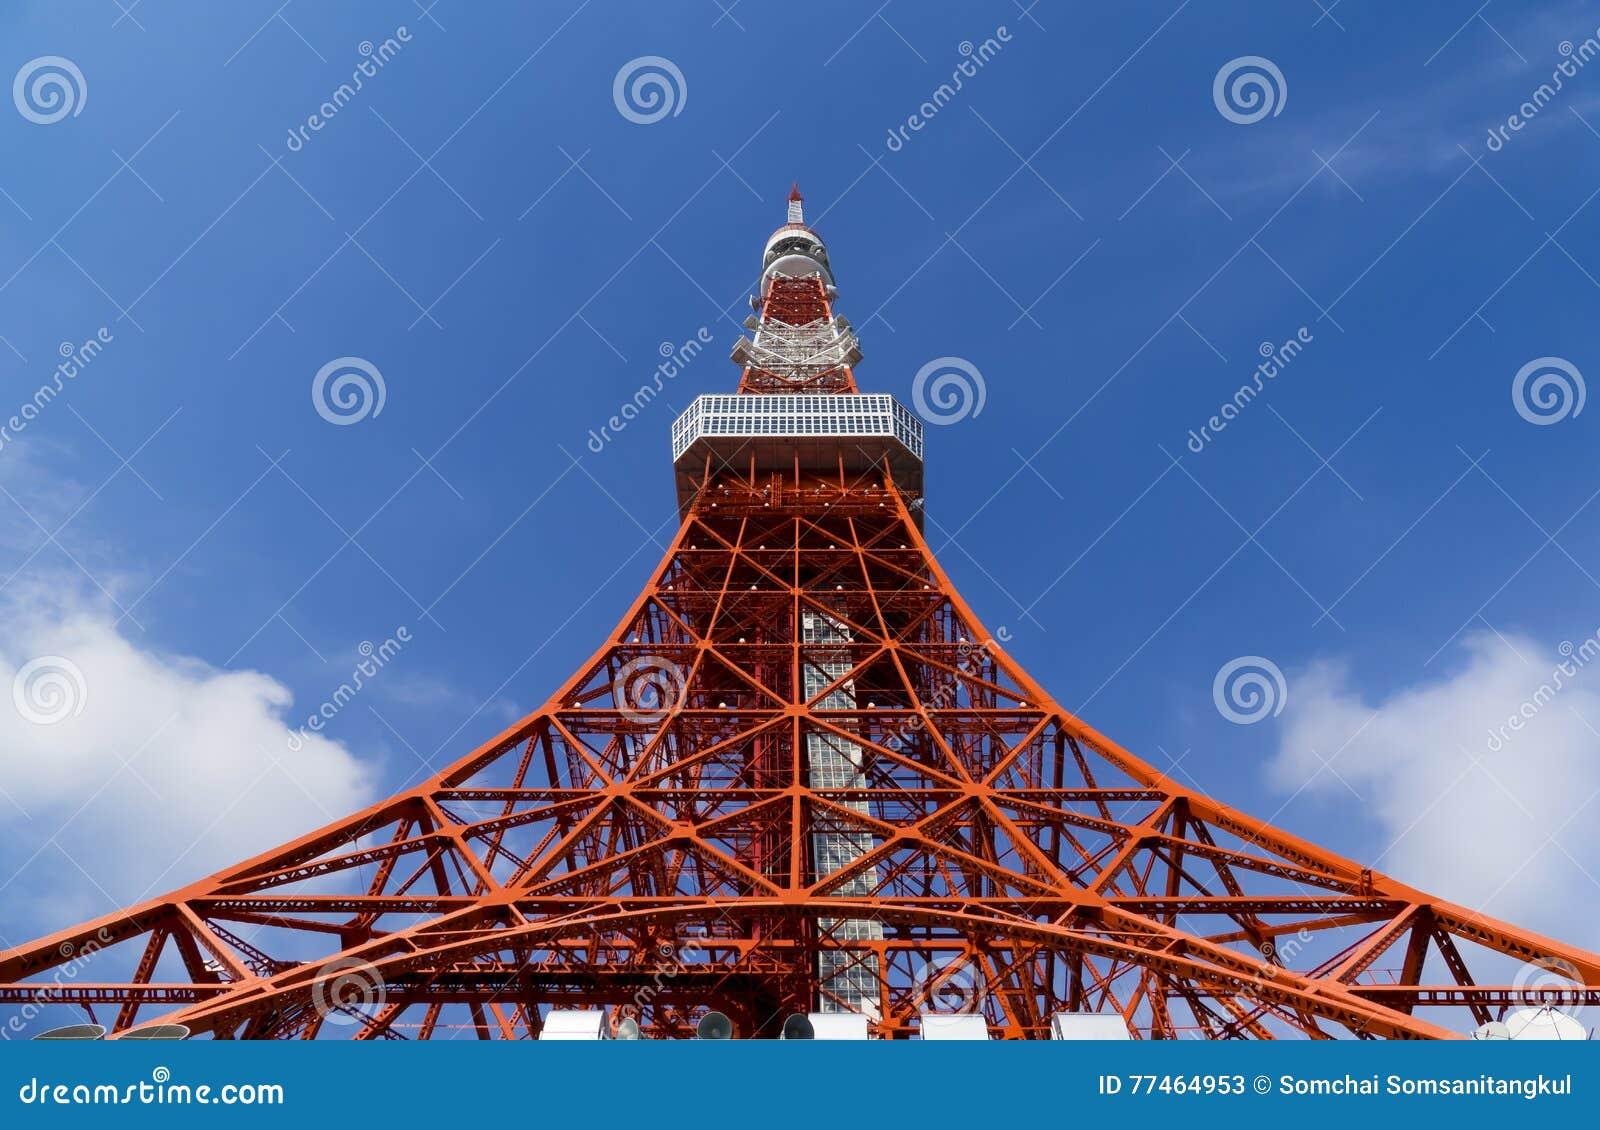 Башня токио, ориентир ориентир Японии в голубом небе